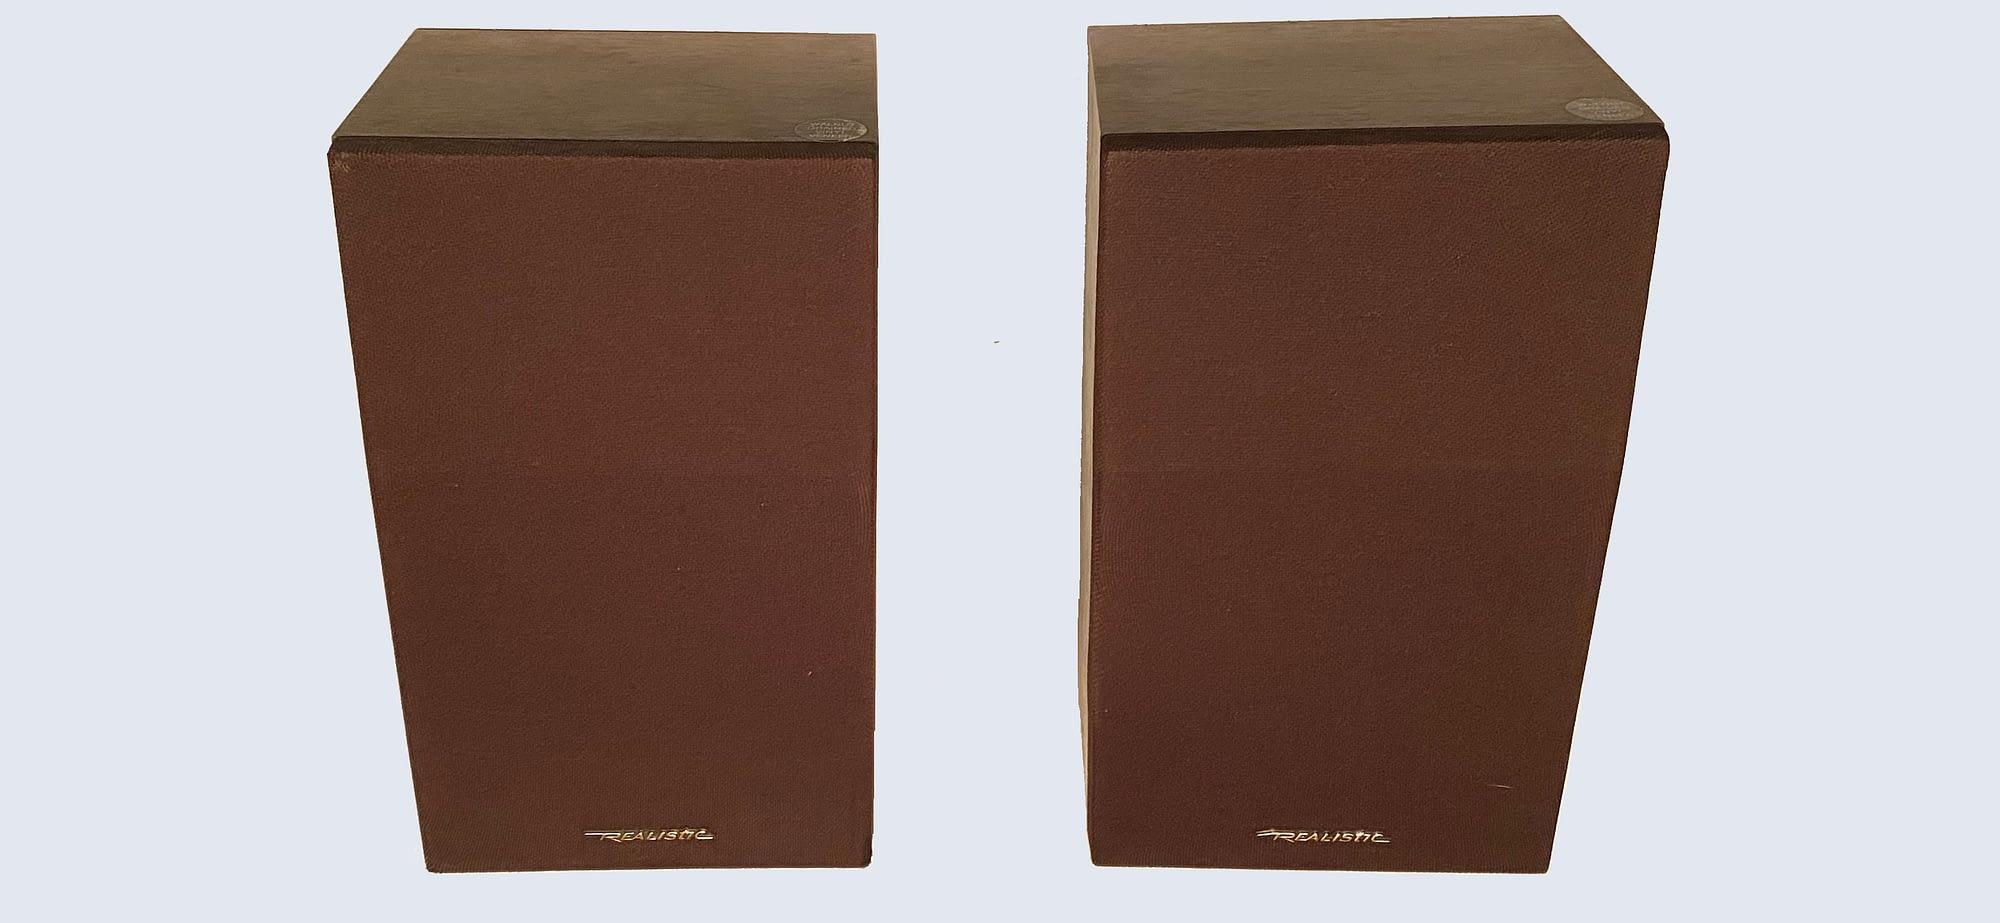 Realistic Minimus 26 speakers